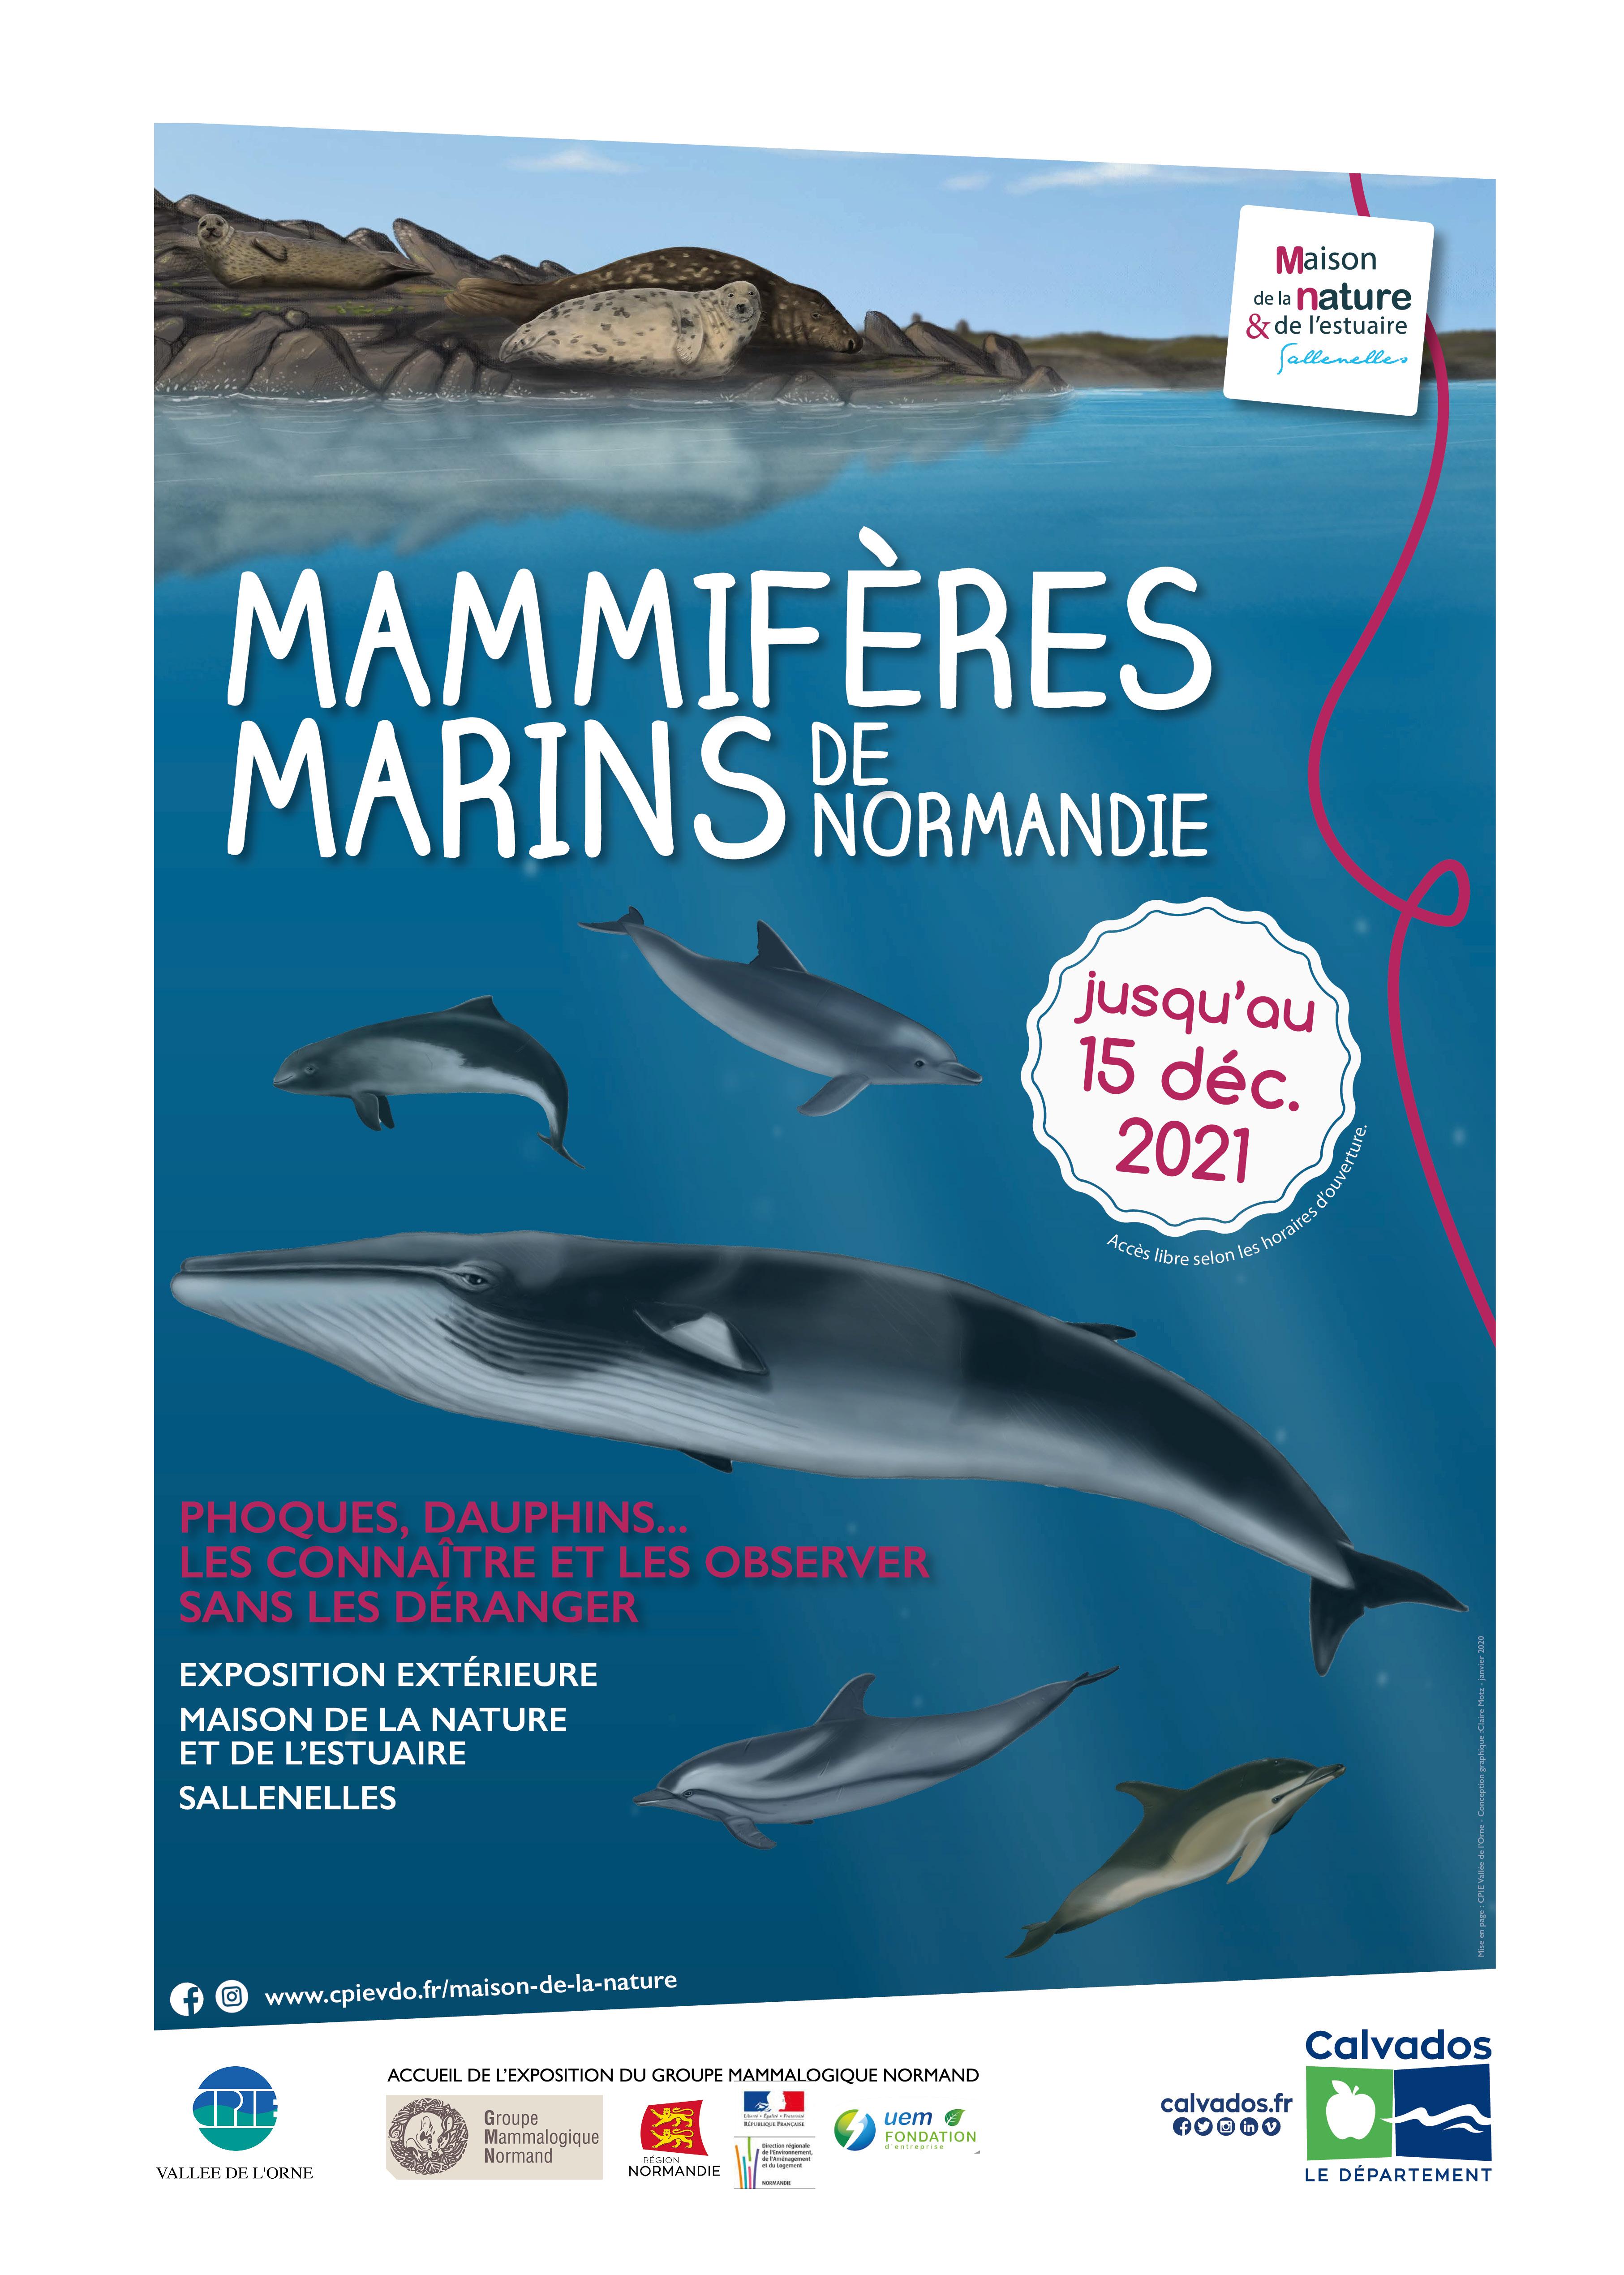 Mammifères marins de Normandie